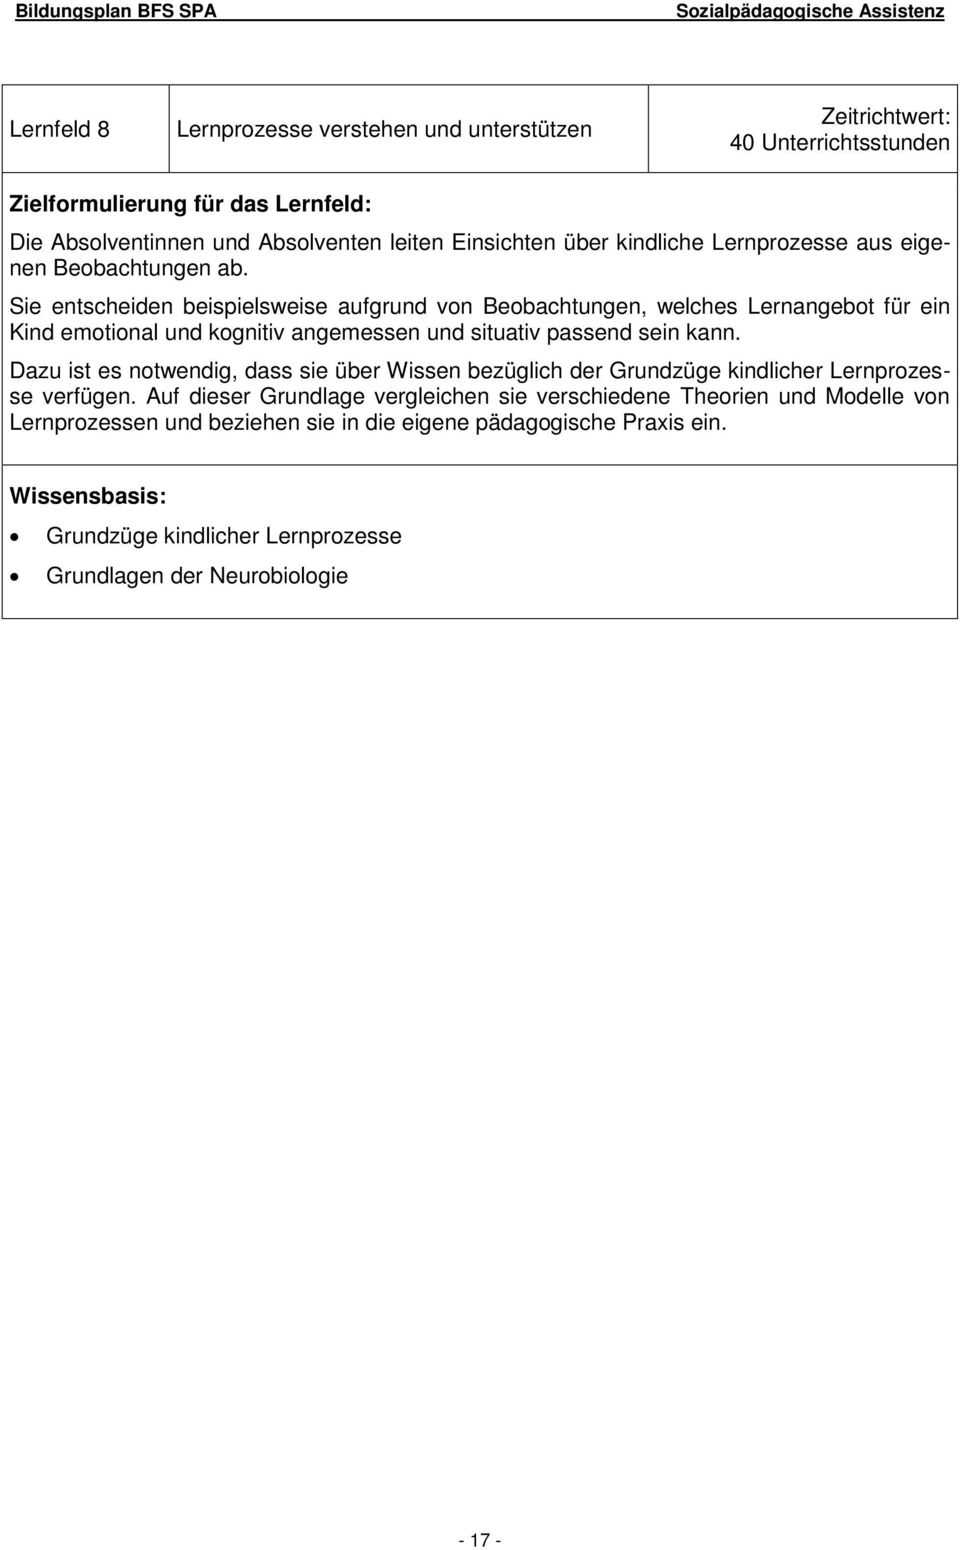 Bildungsplan Berufsfachschule Fur Sozialpadagogische Assistenz